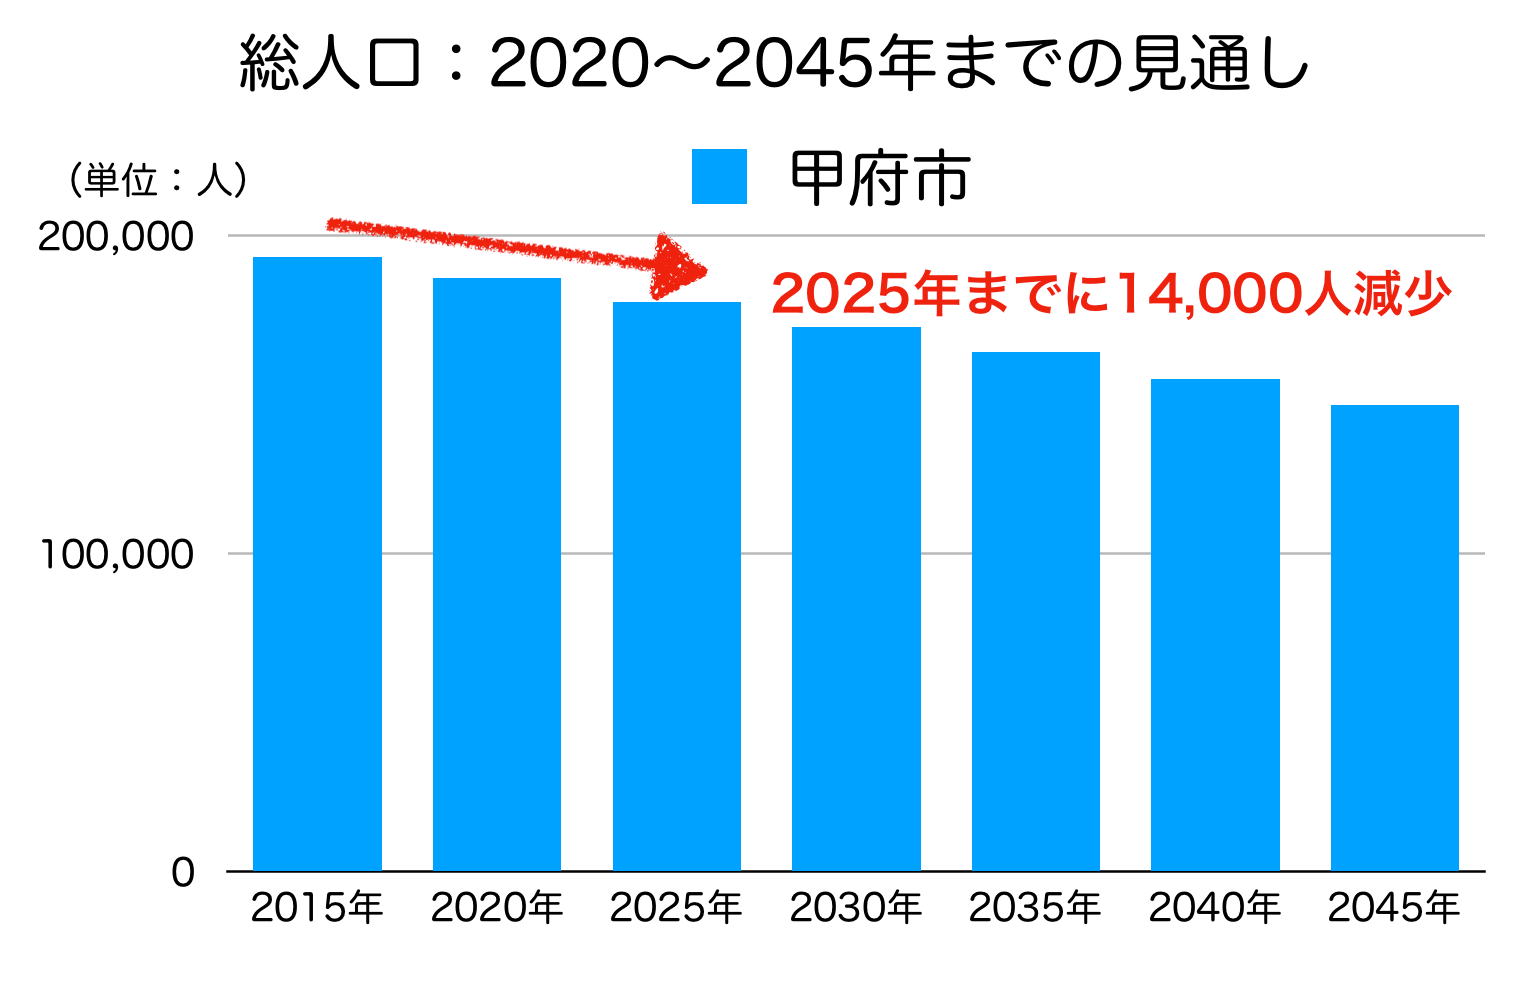 甲府市の人口予測